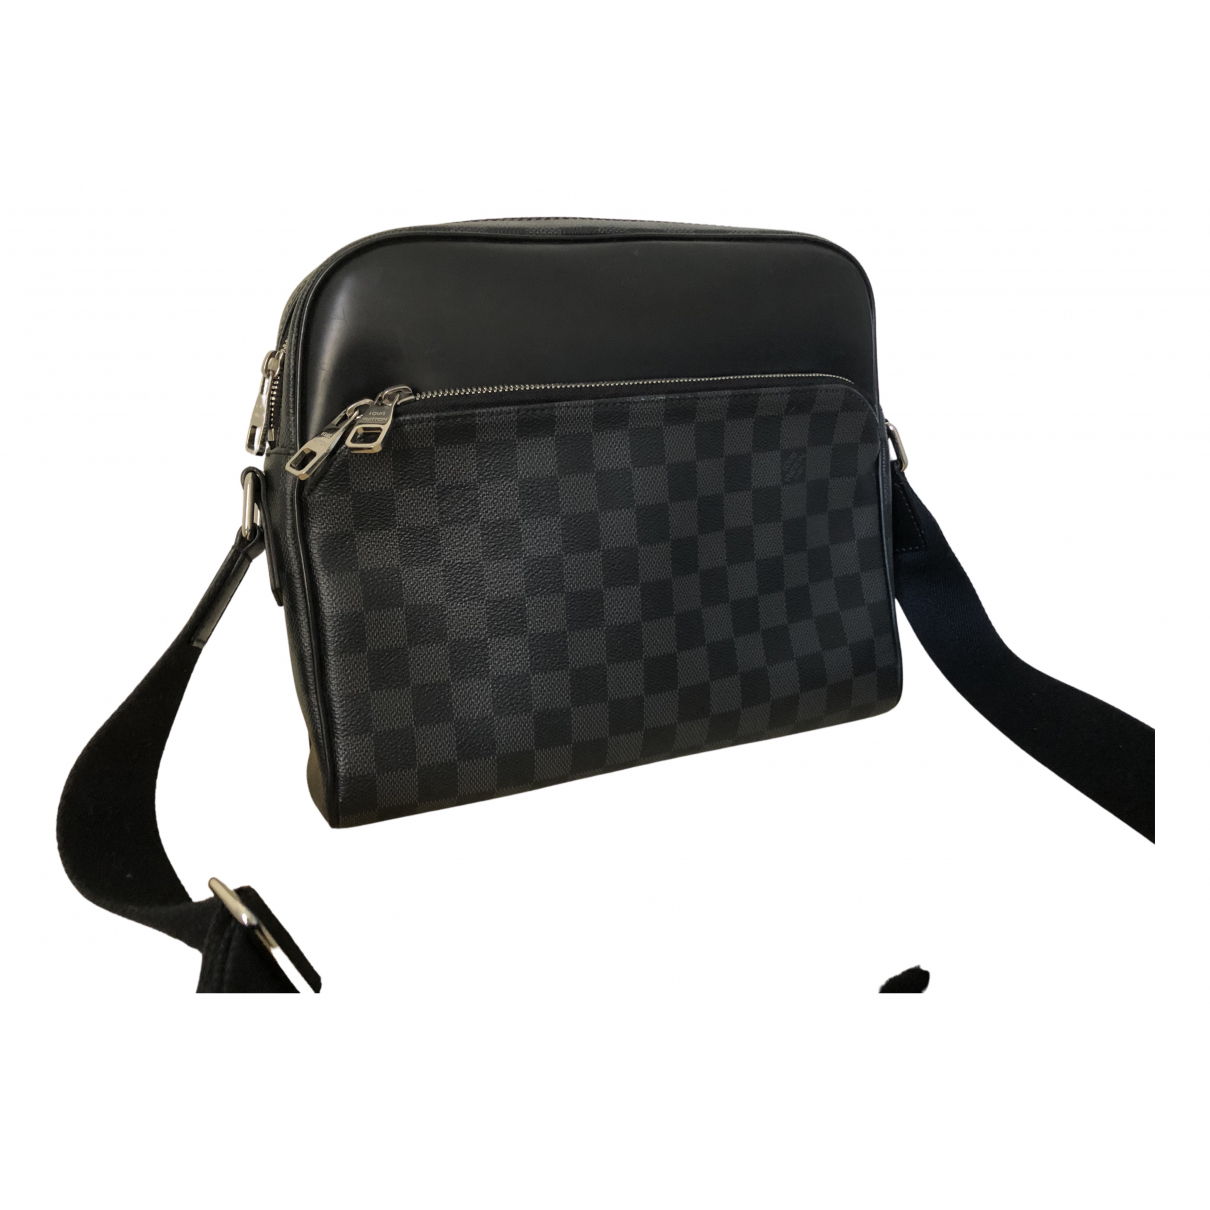 Louis Vuitton Daytona Reporter Anthracite Cloth bag for Men N